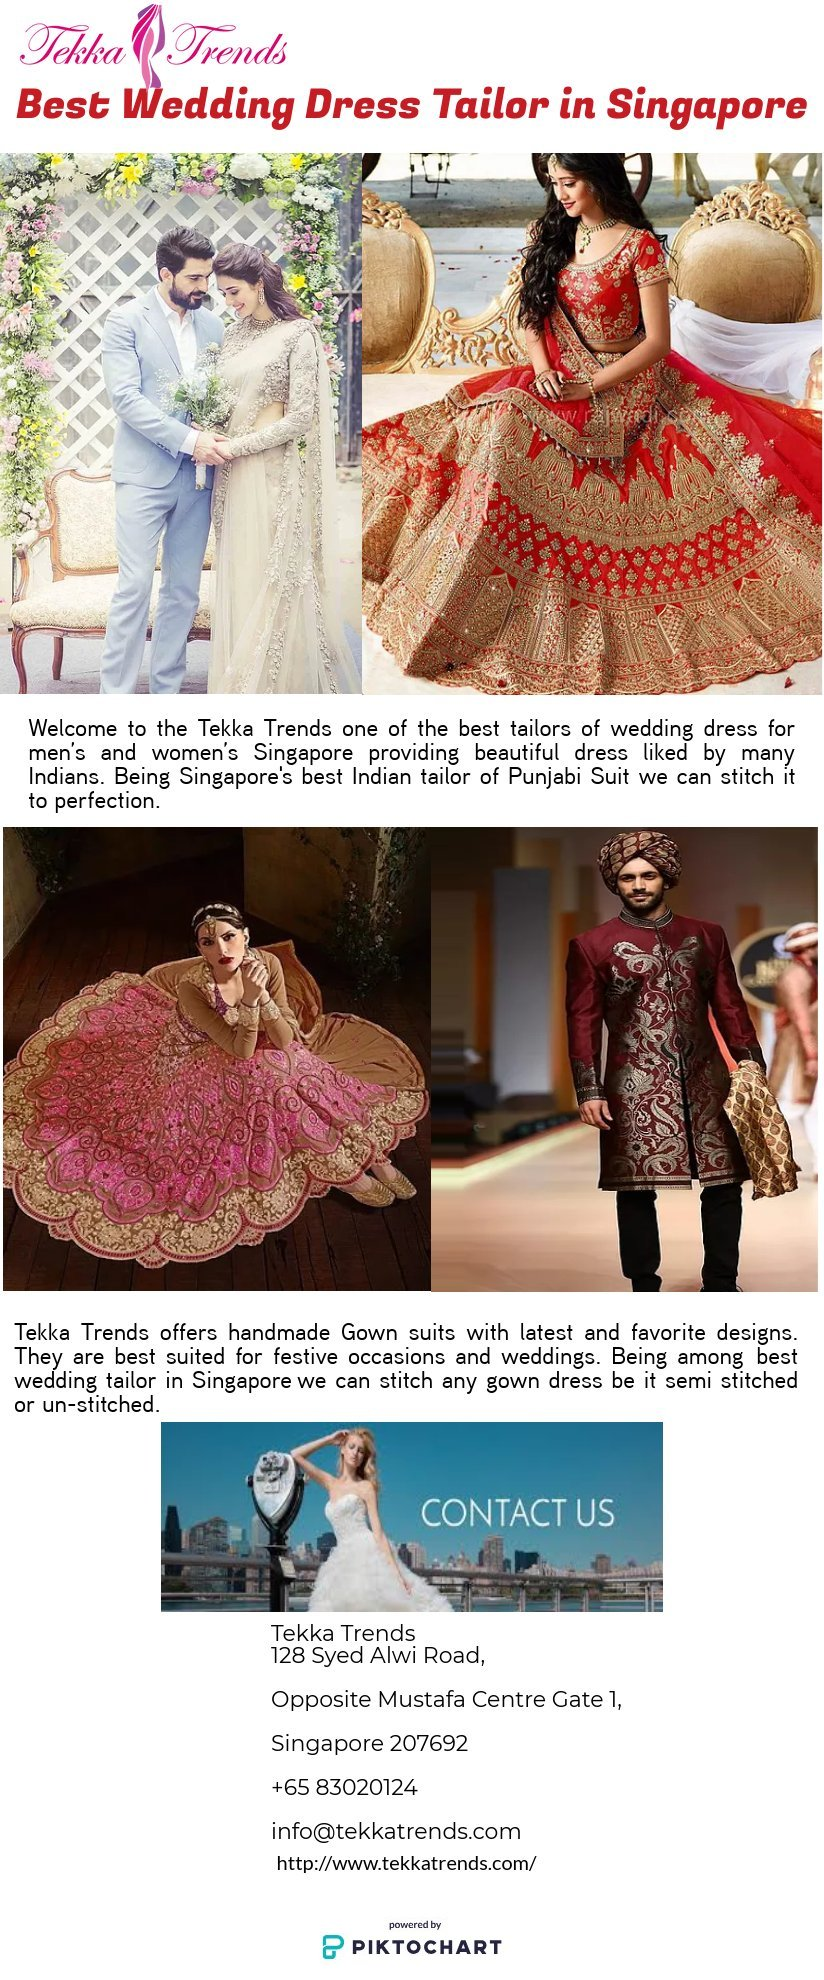 Wedding dress tailor | Piktochart Visual Editor